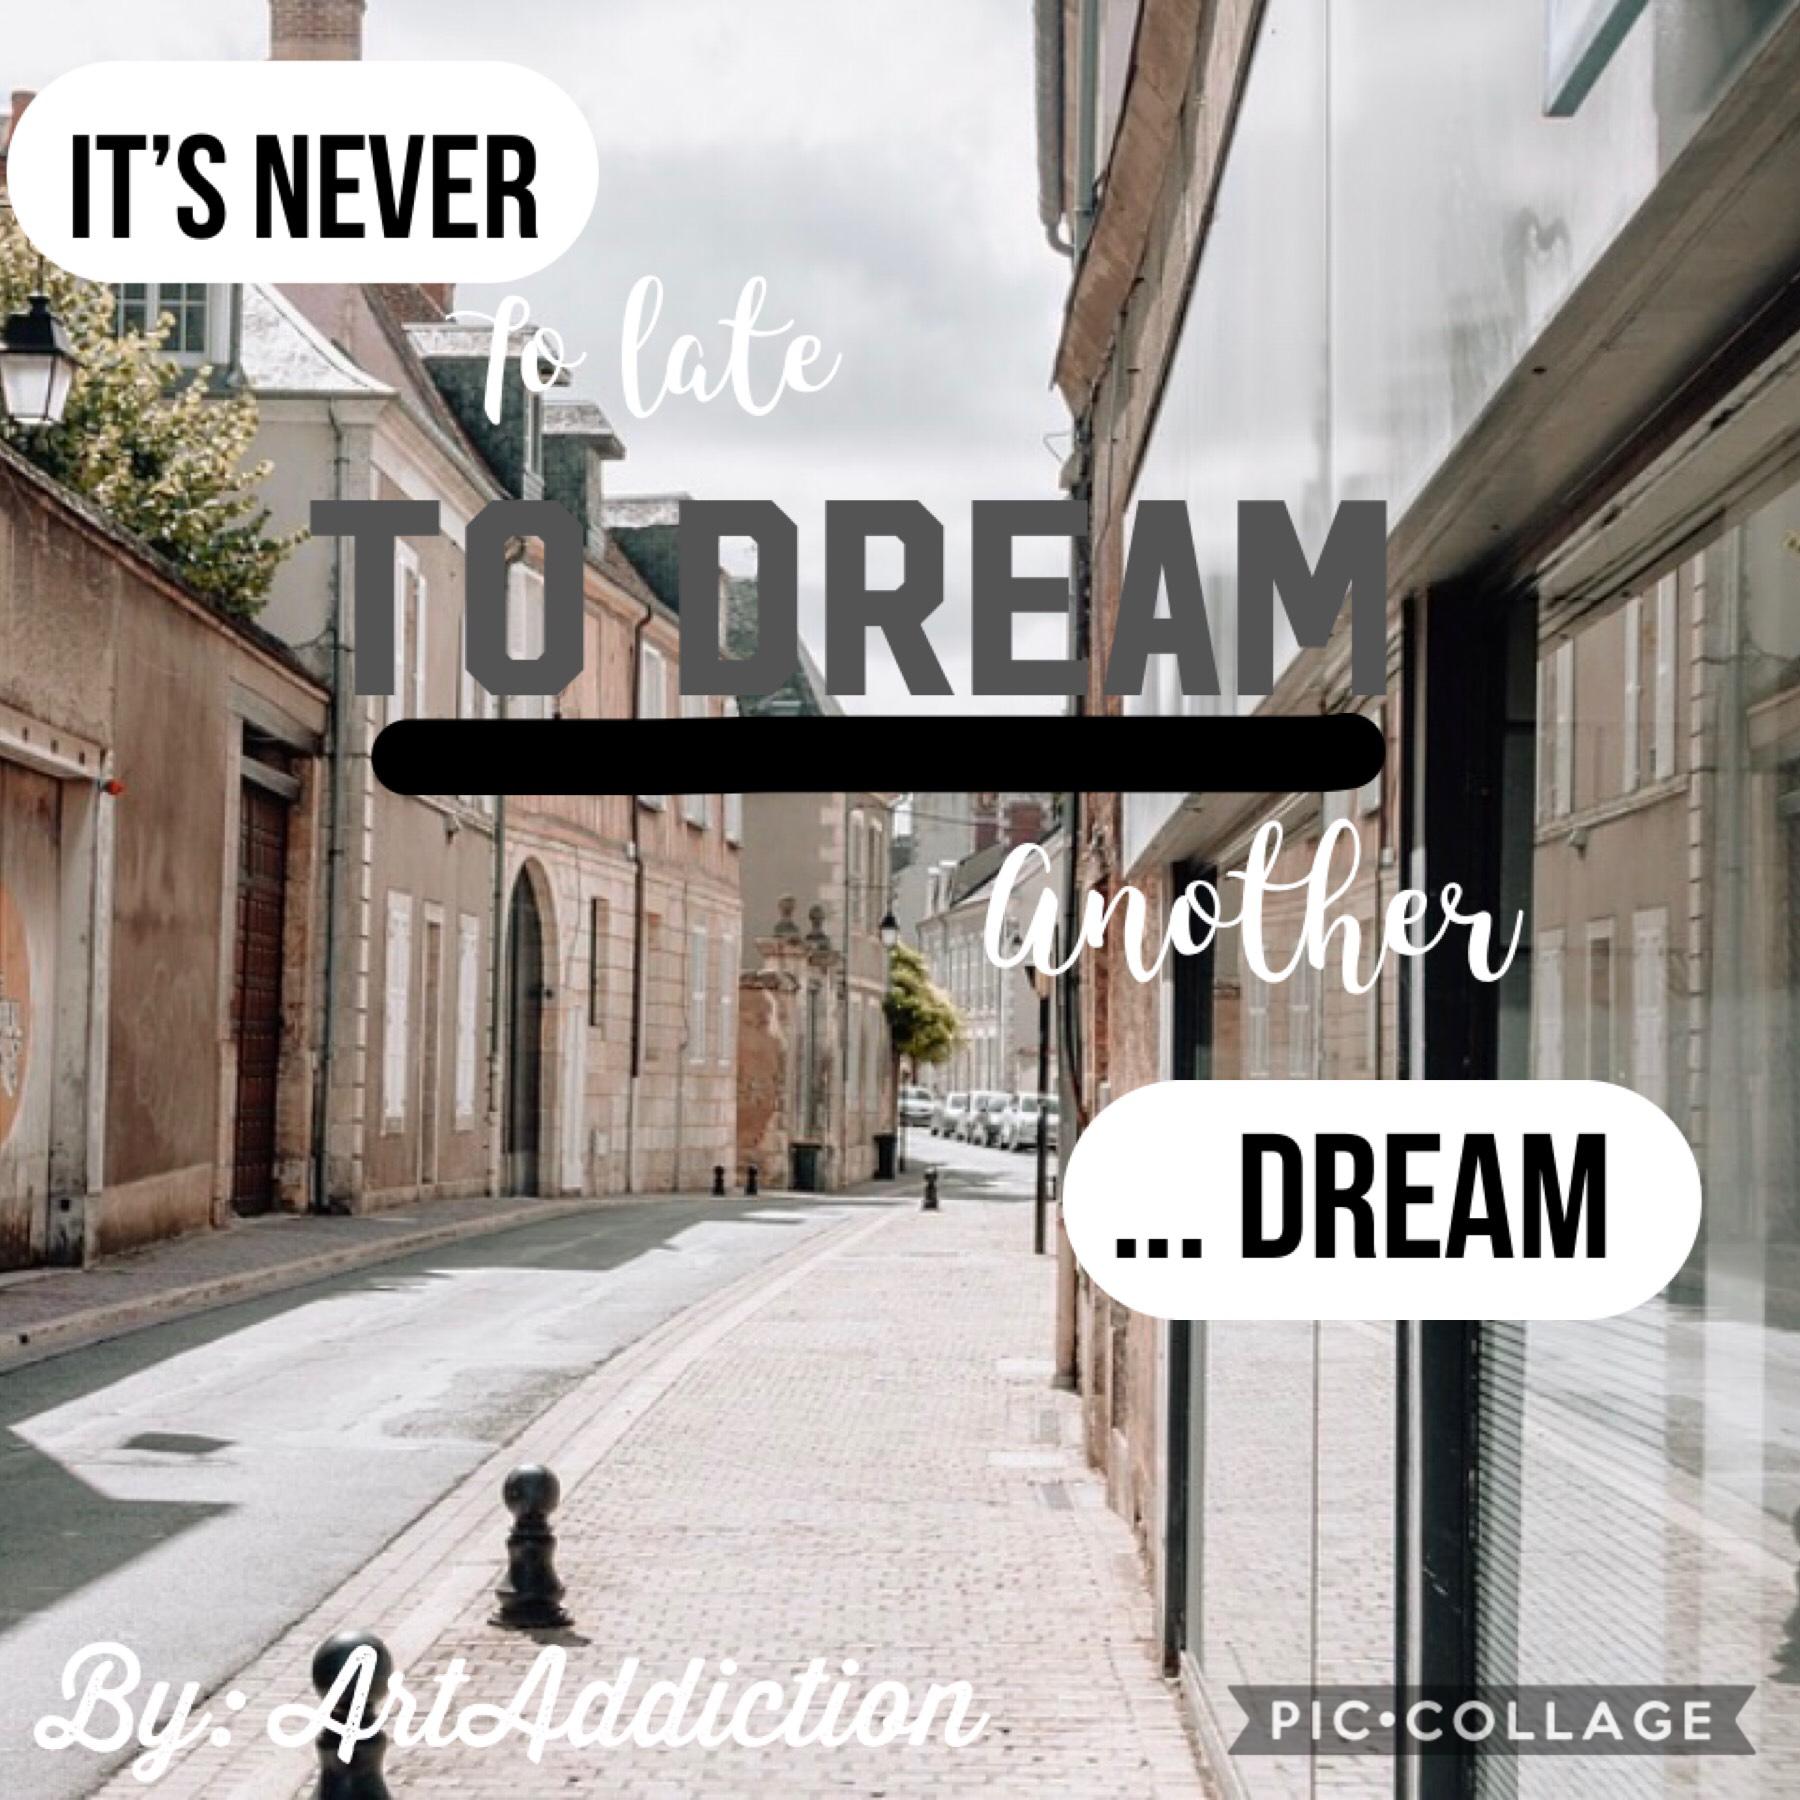 Got this idea from ArtAddiction. 😊 Go follow him/ her